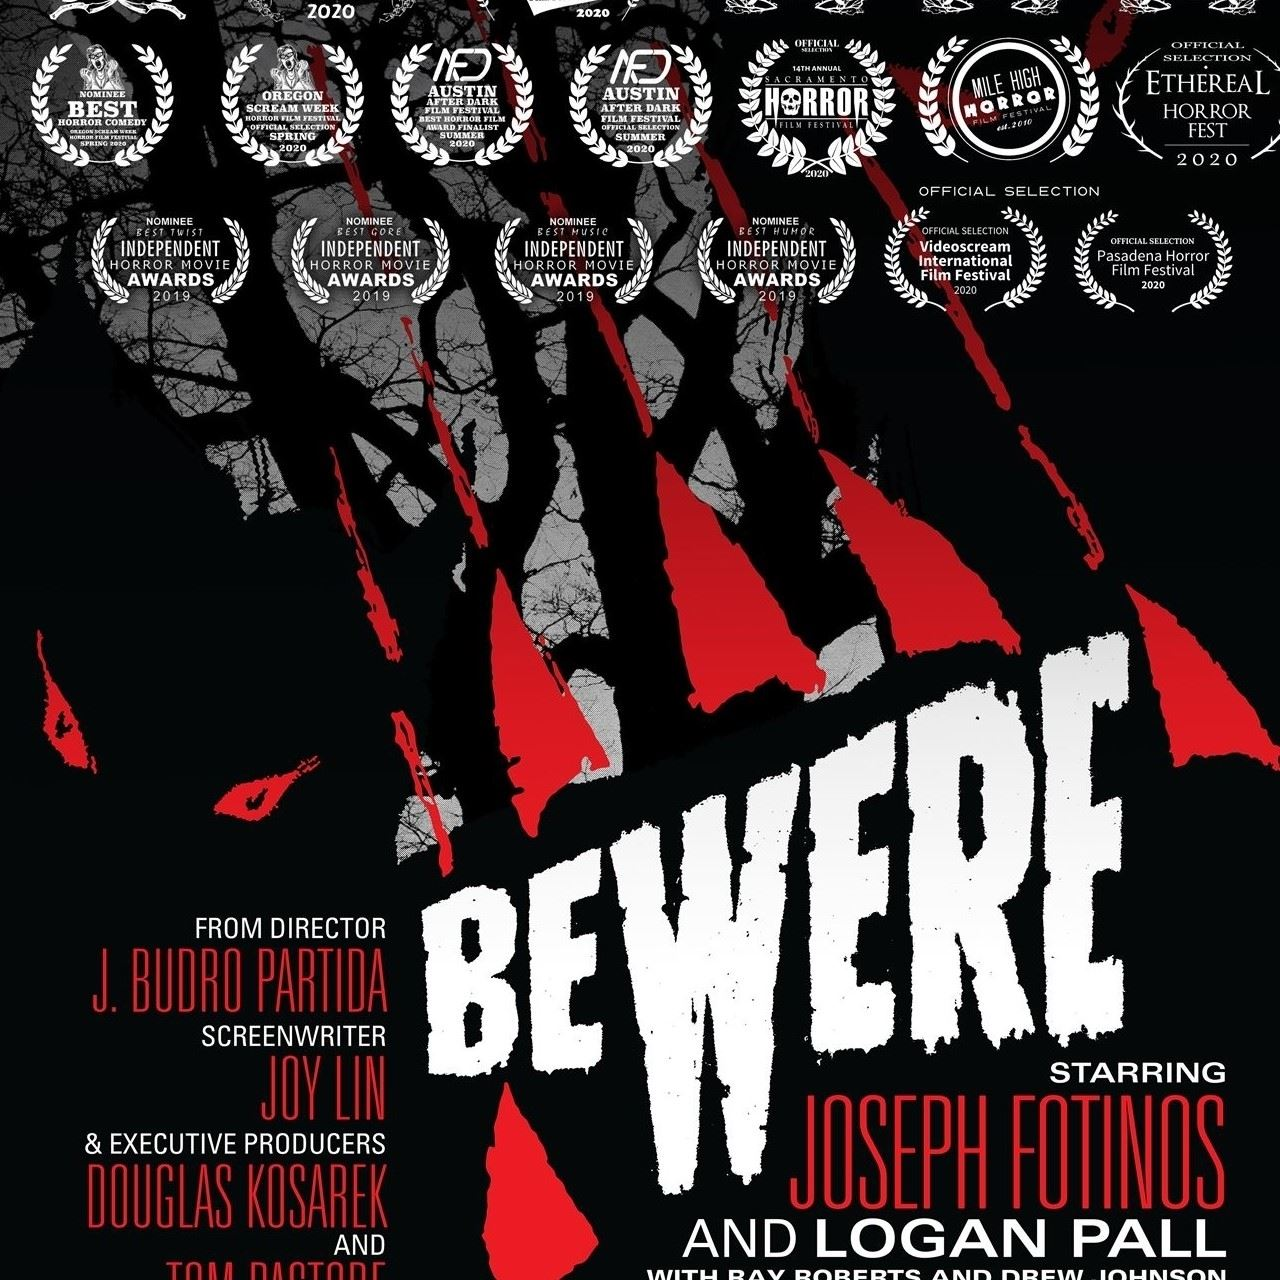 Bewere